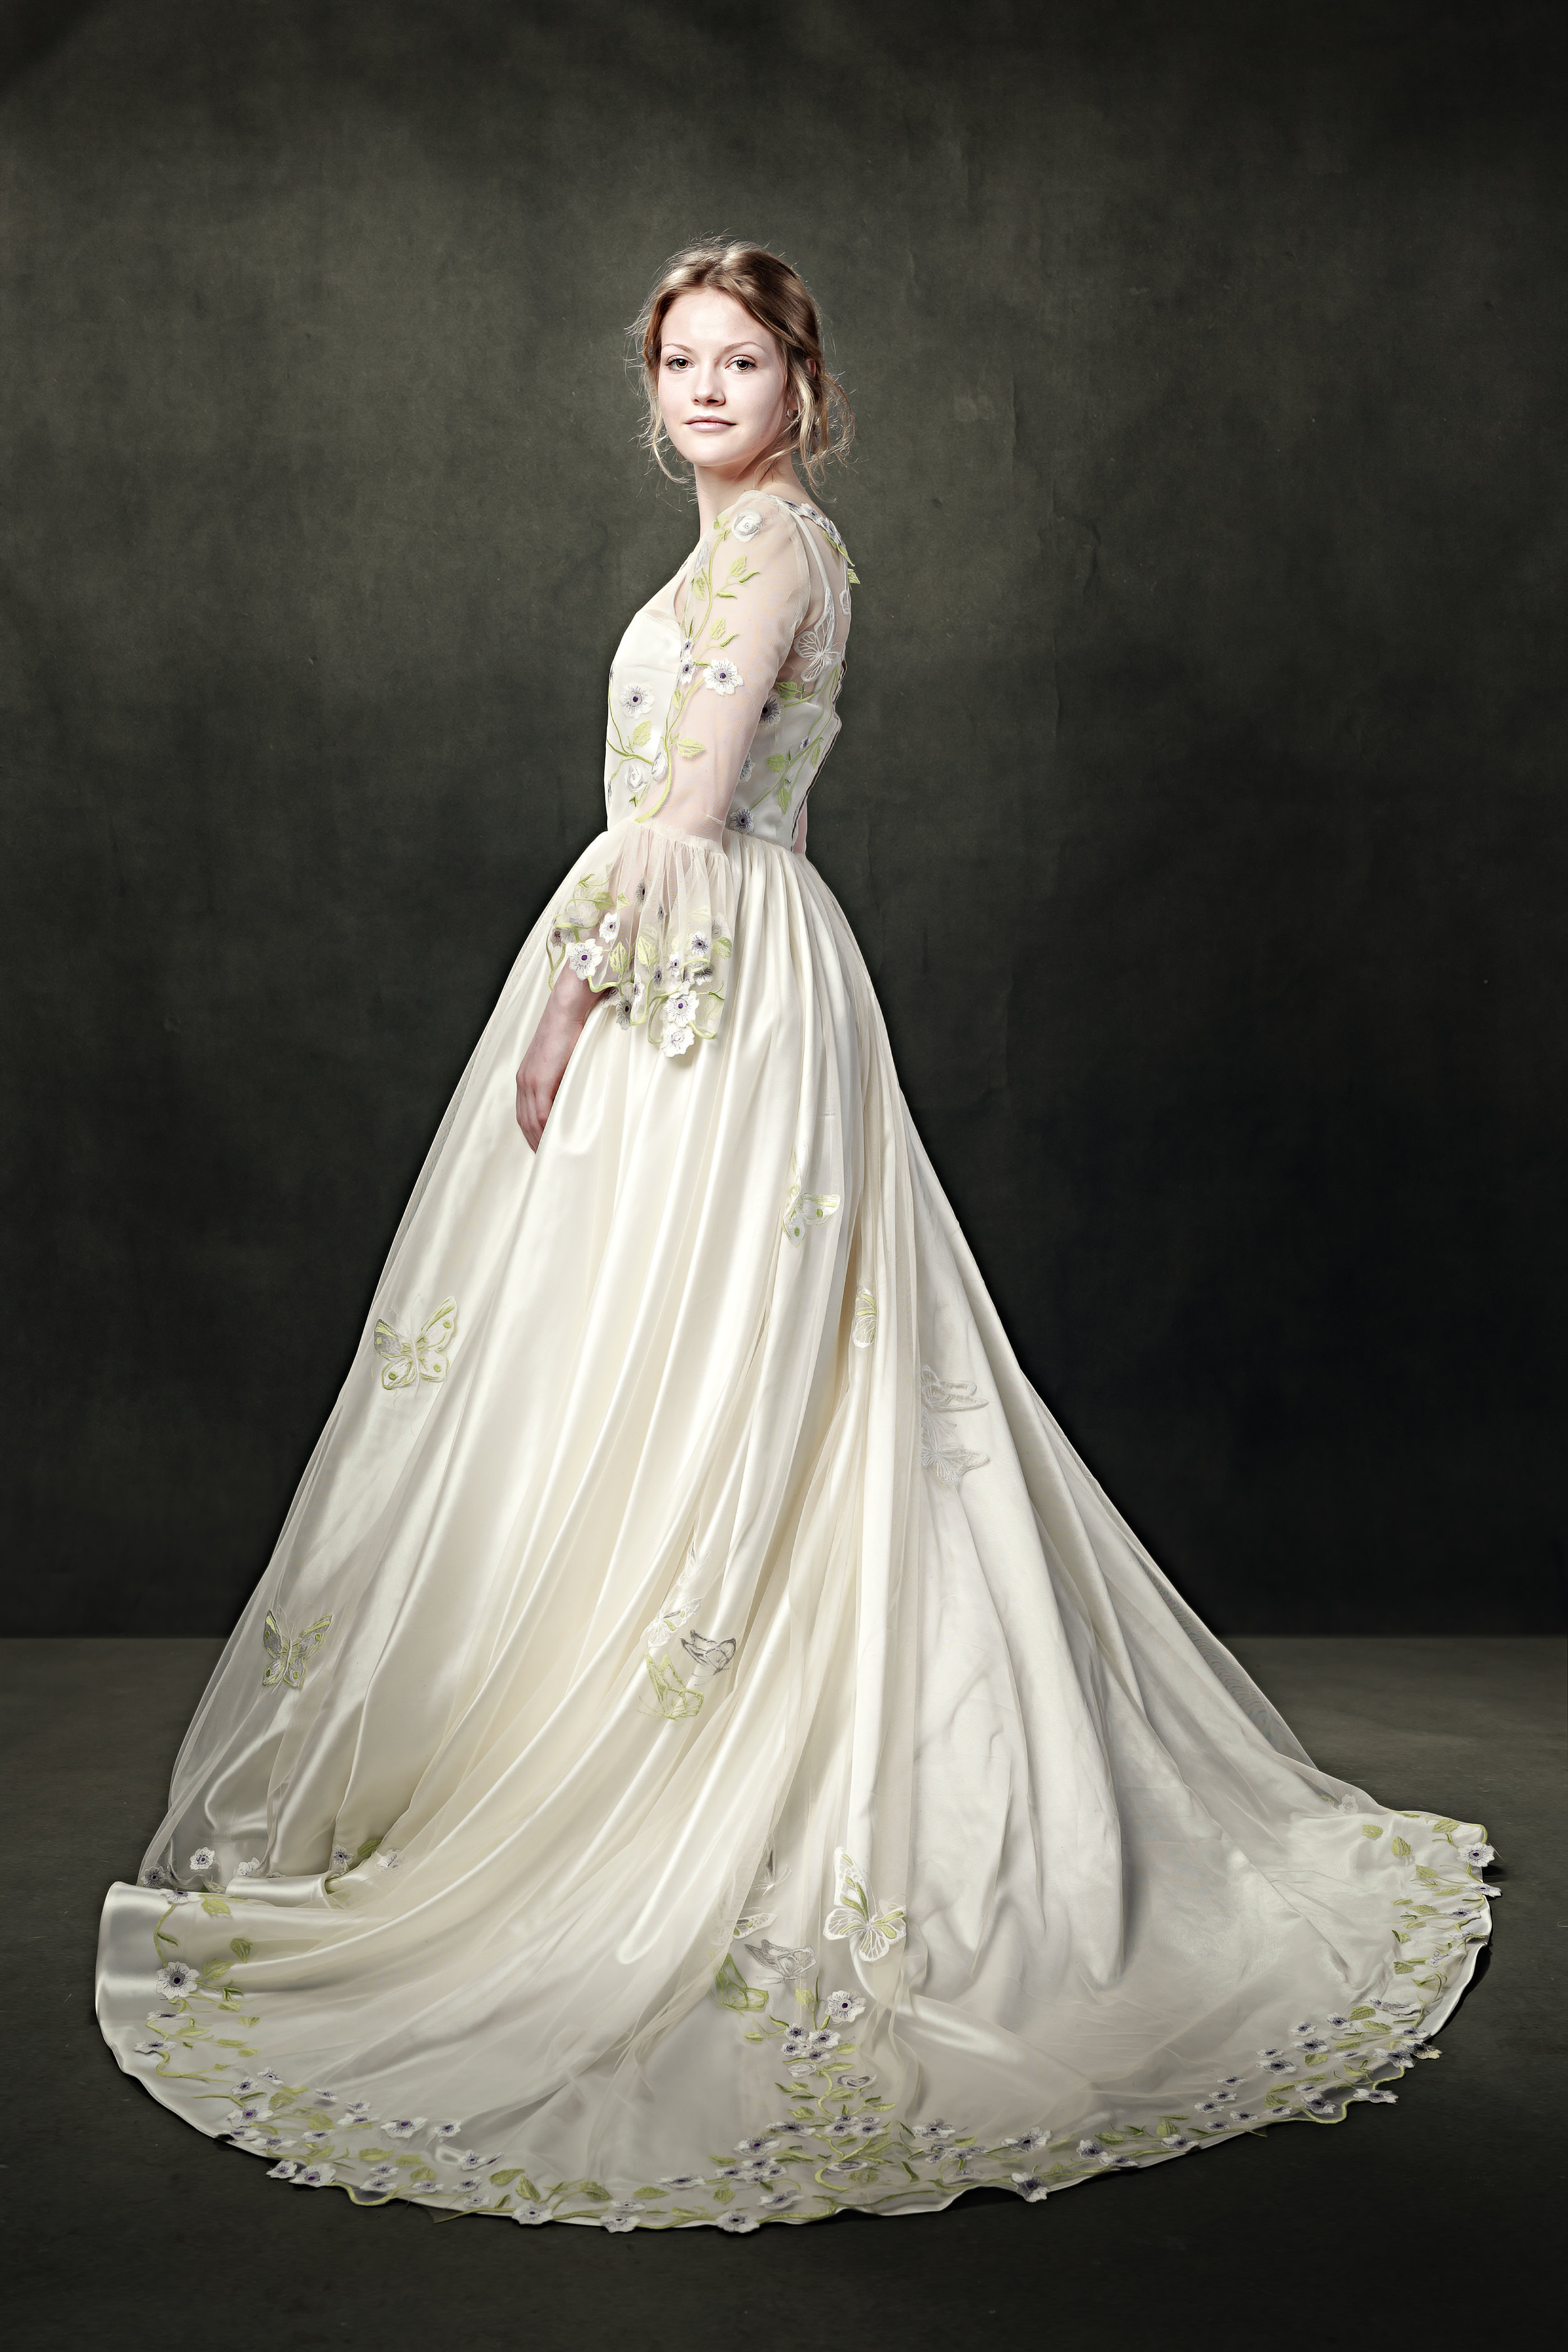 martin dobson wedding dress - 0153 - March 07, 2018 - copyright Foyers Photography-Edit.jpg